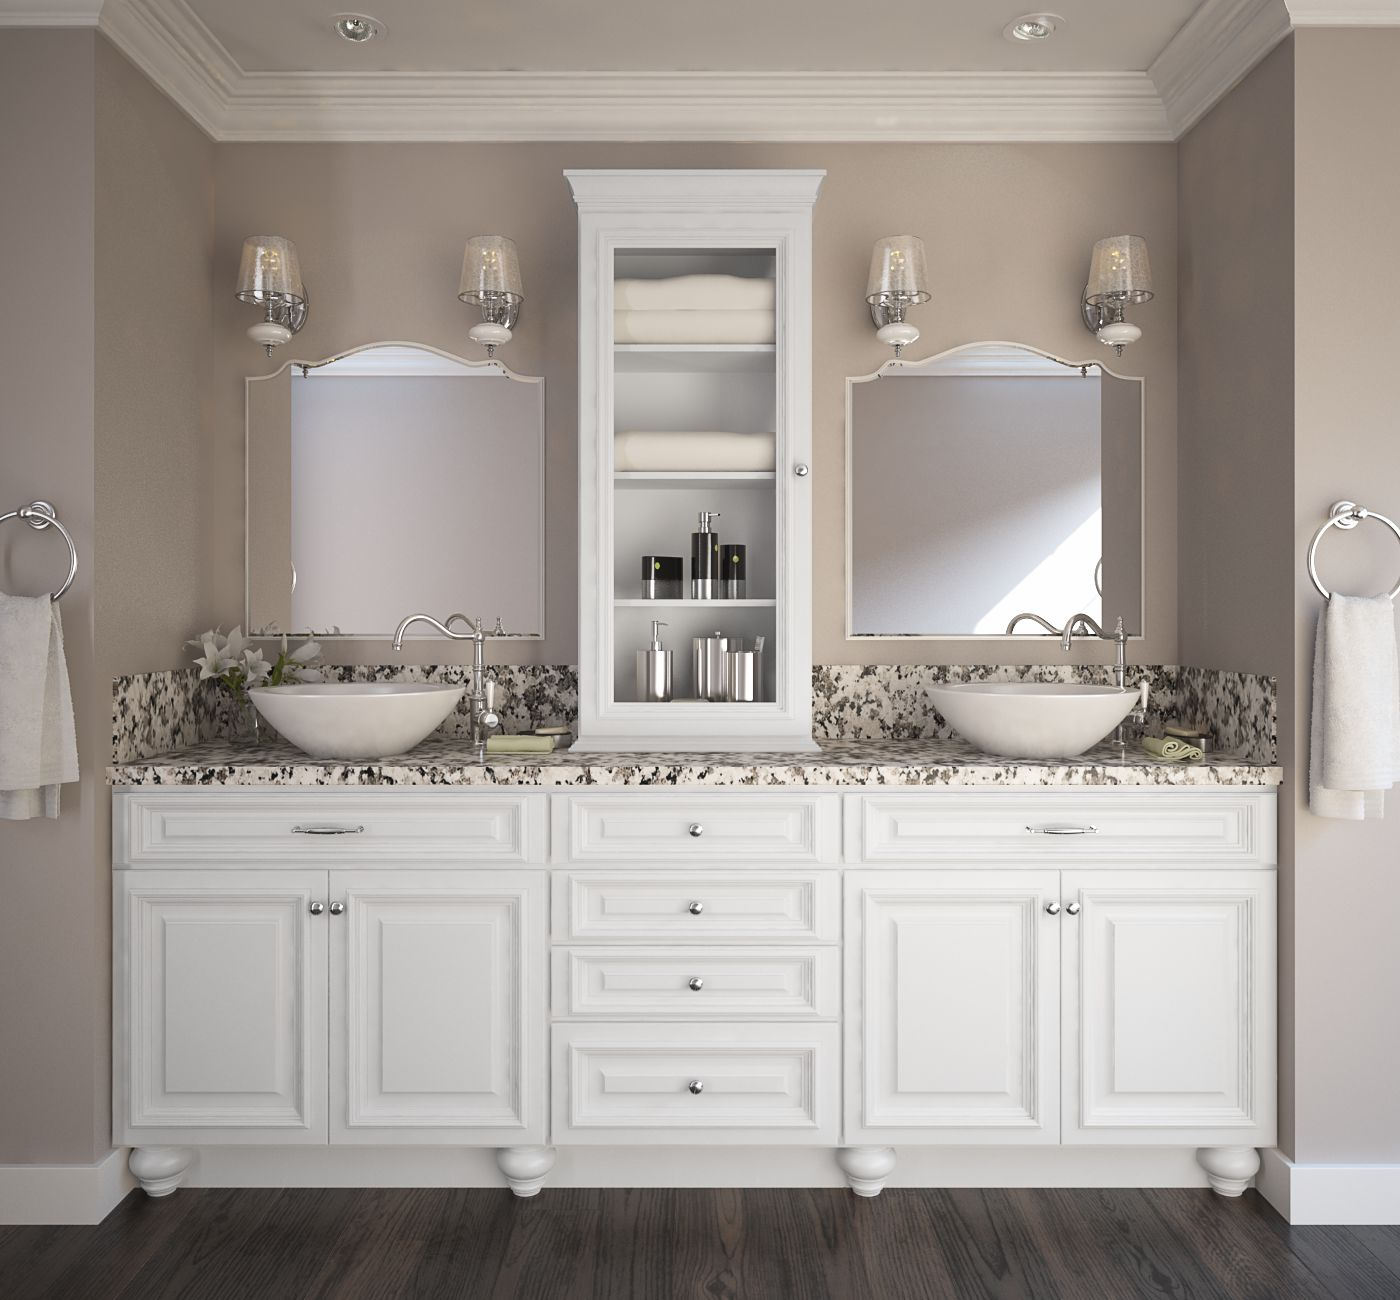 Semi Custom Kitchen Cabinets: Semi Custom Roosevelt White Pre-Assembled Kitchen Cabinets